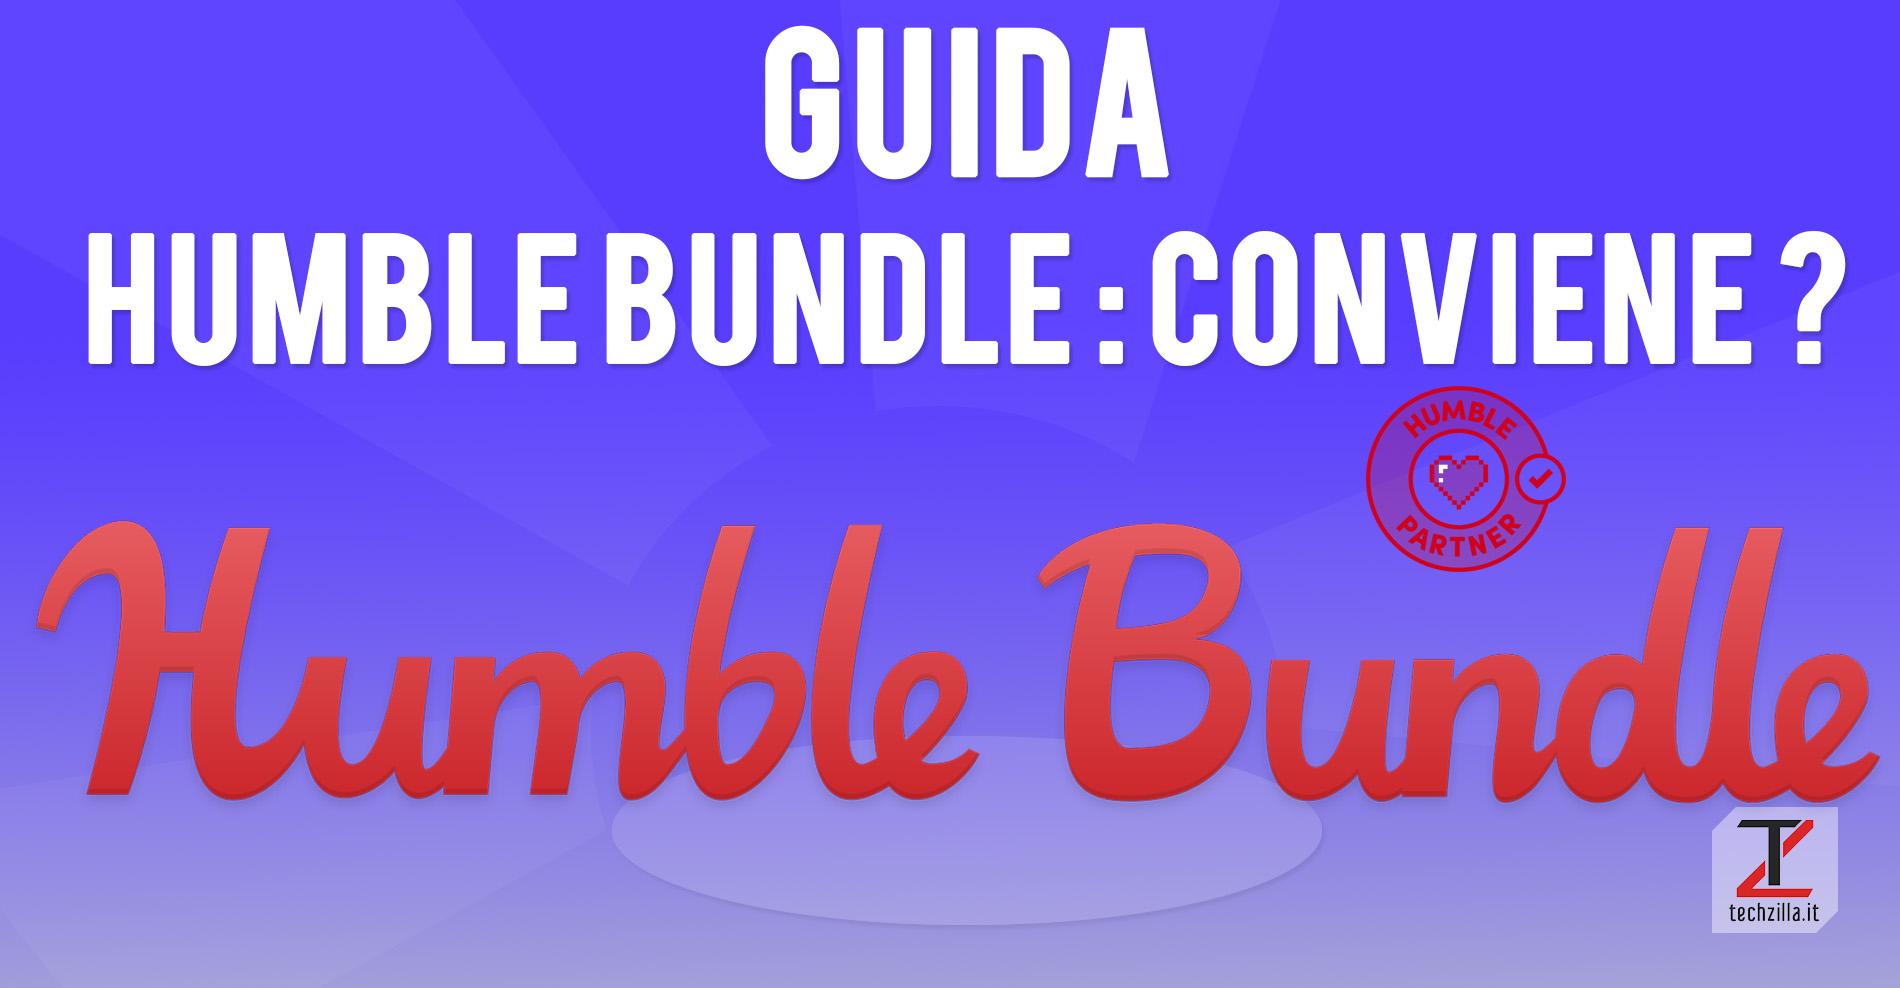 Humble Bundle Guida